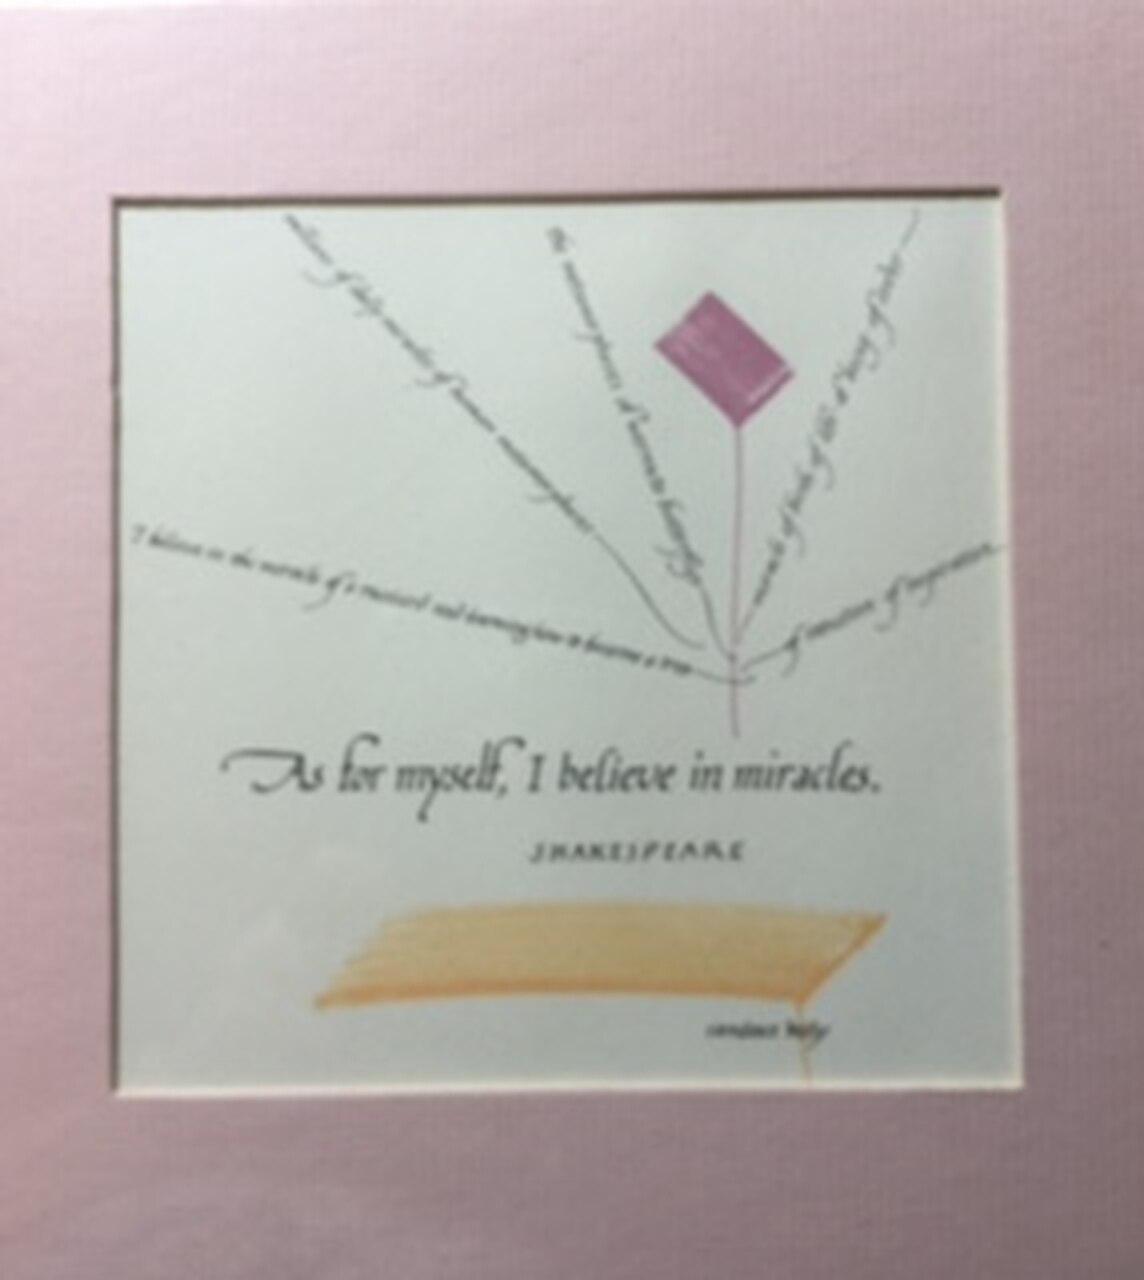 calligraphymiraclesquote-70814.1450551381.jpg